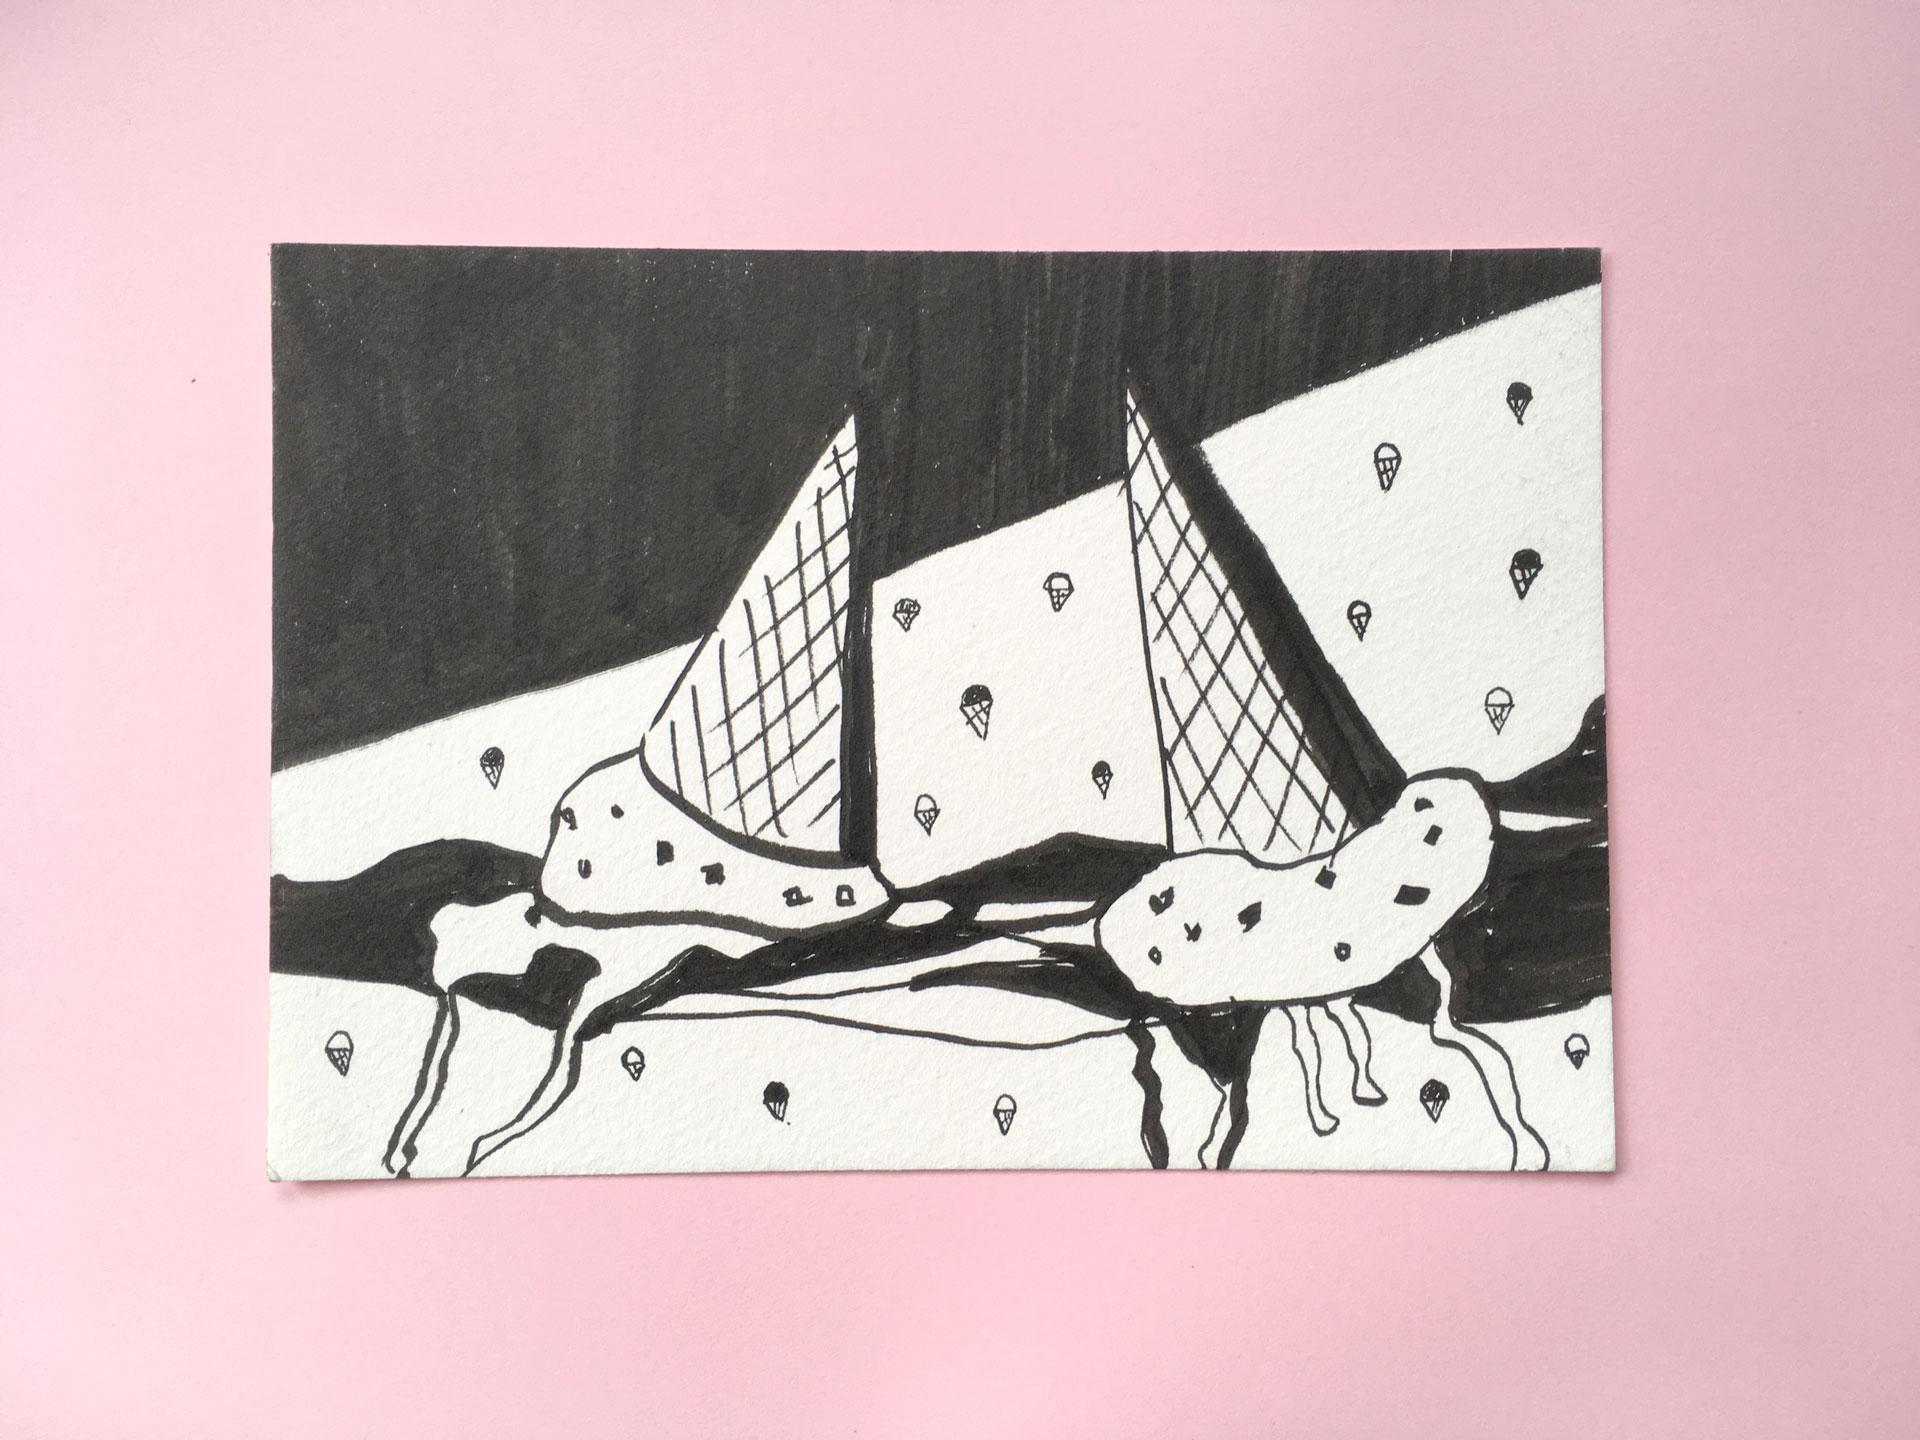 Double-Scoop-Illustration-by-Miriam-McWilliam-Studio-Mimi-Moon